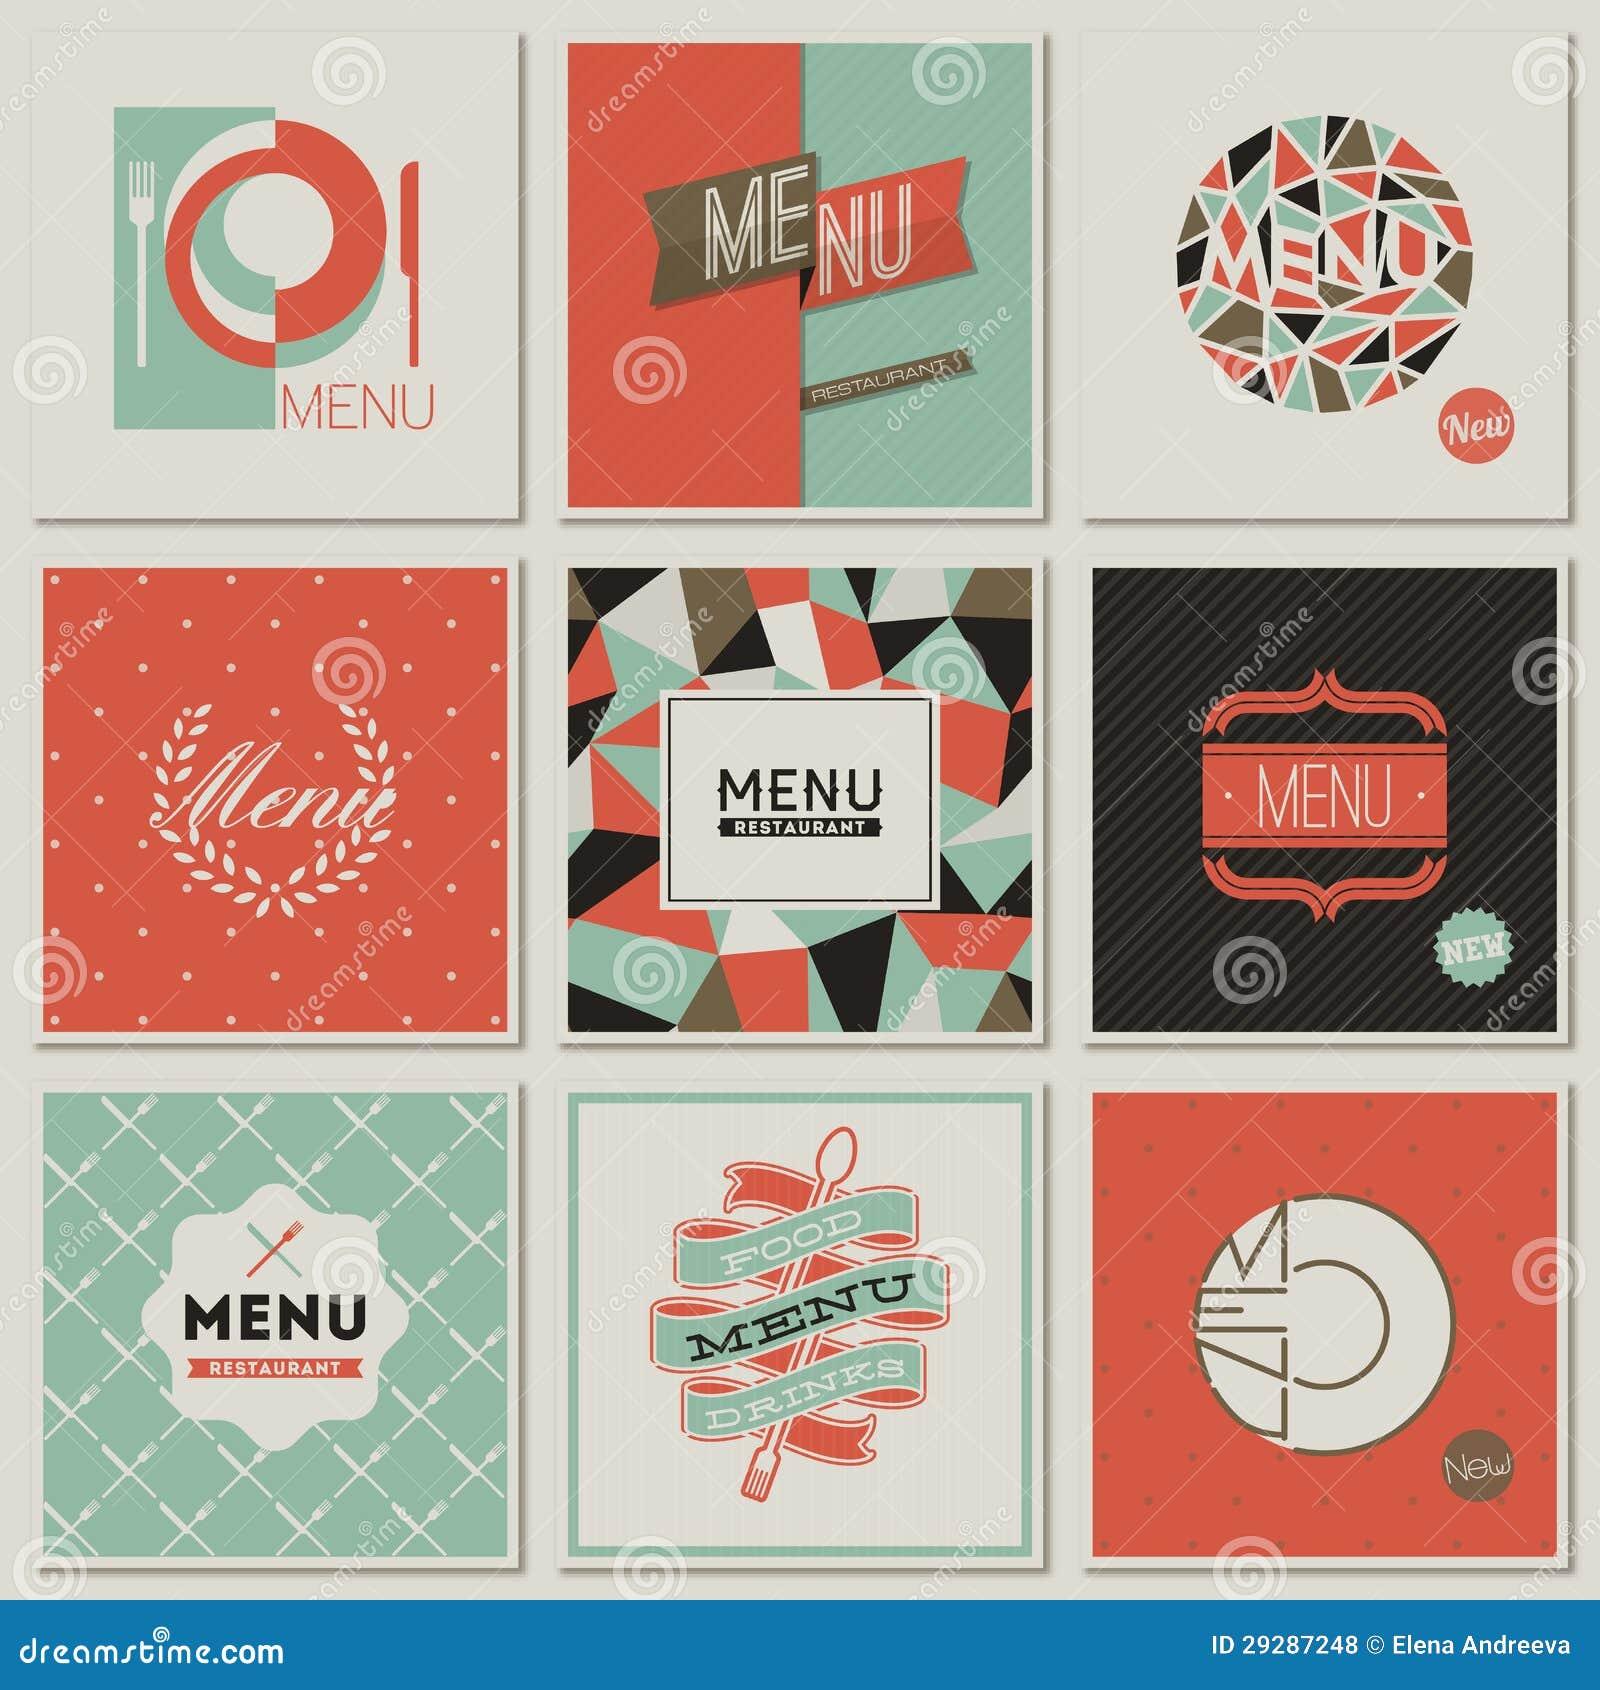 Restaurant Menu Designs Retro styled Vectors Royalty Free